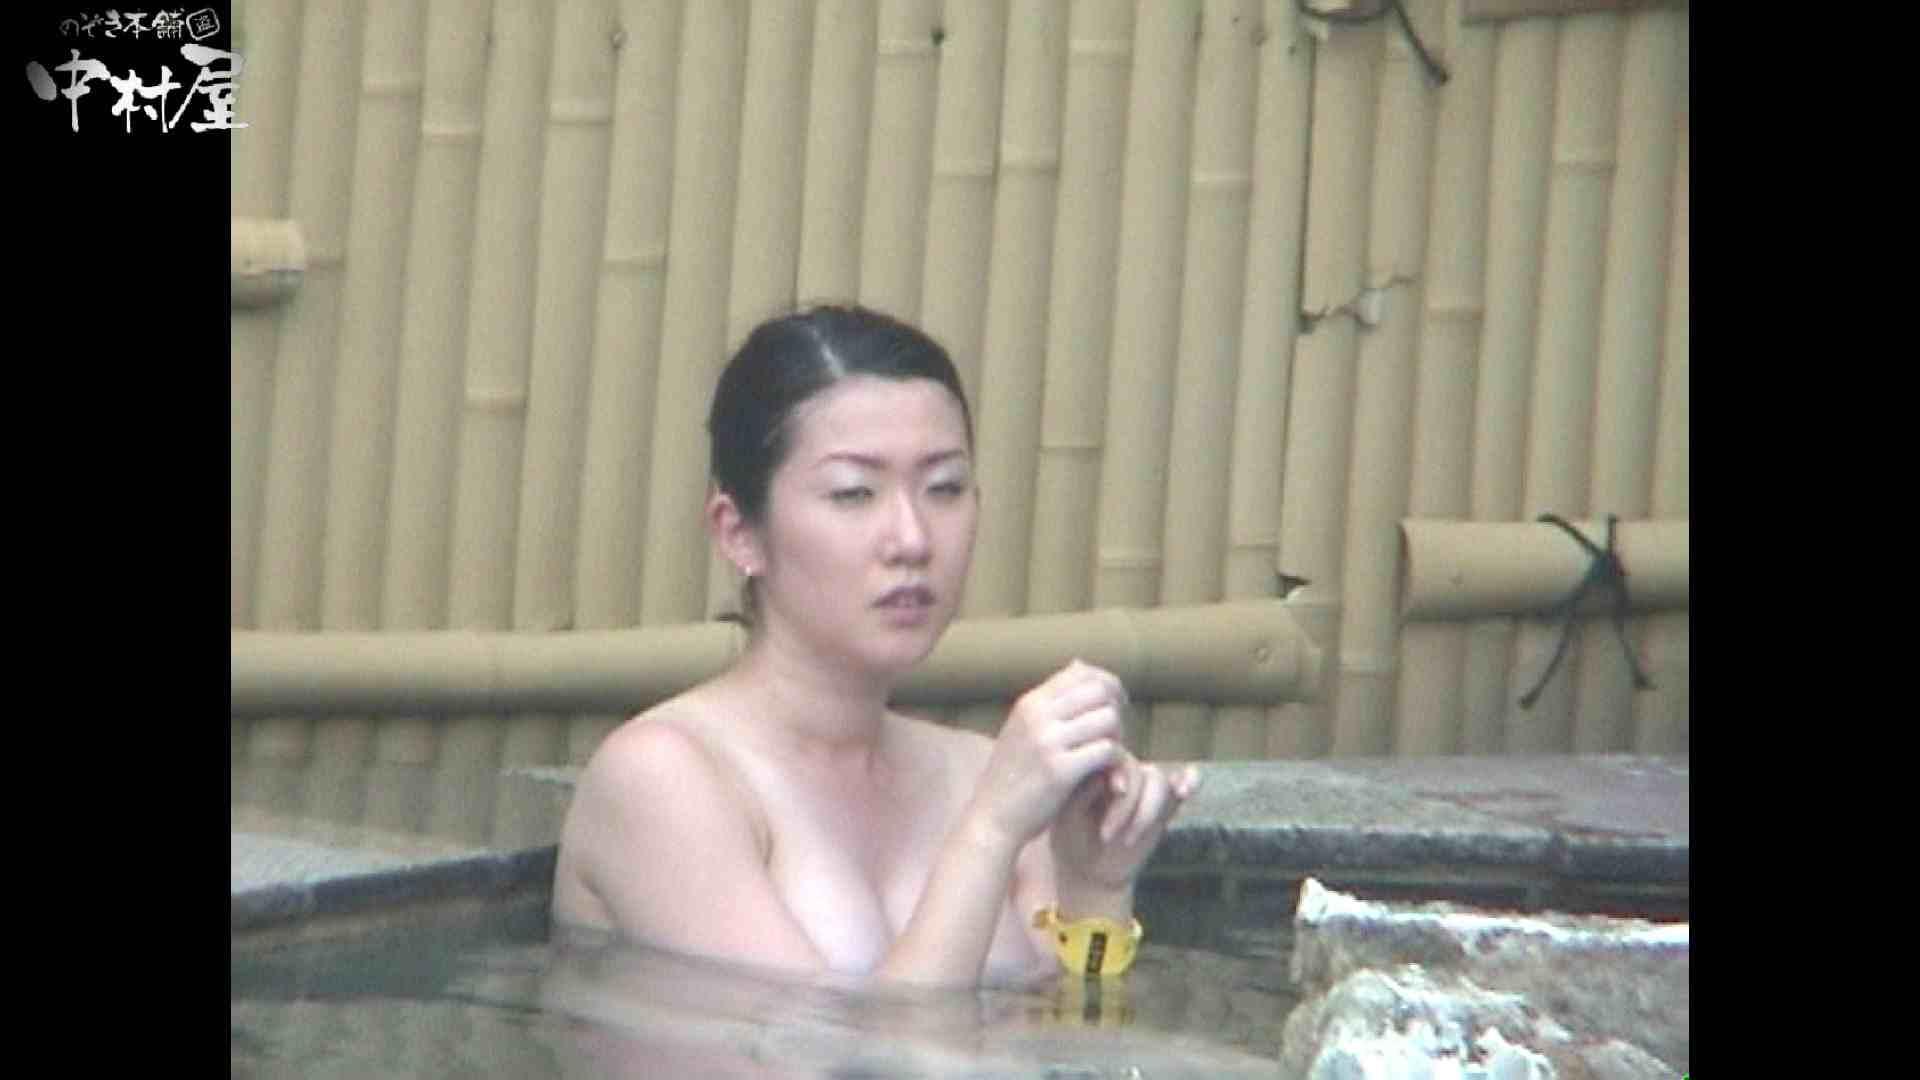 Aquaな露天風呂Vol.961 盗撮 のぞき動画画像 61枚 56